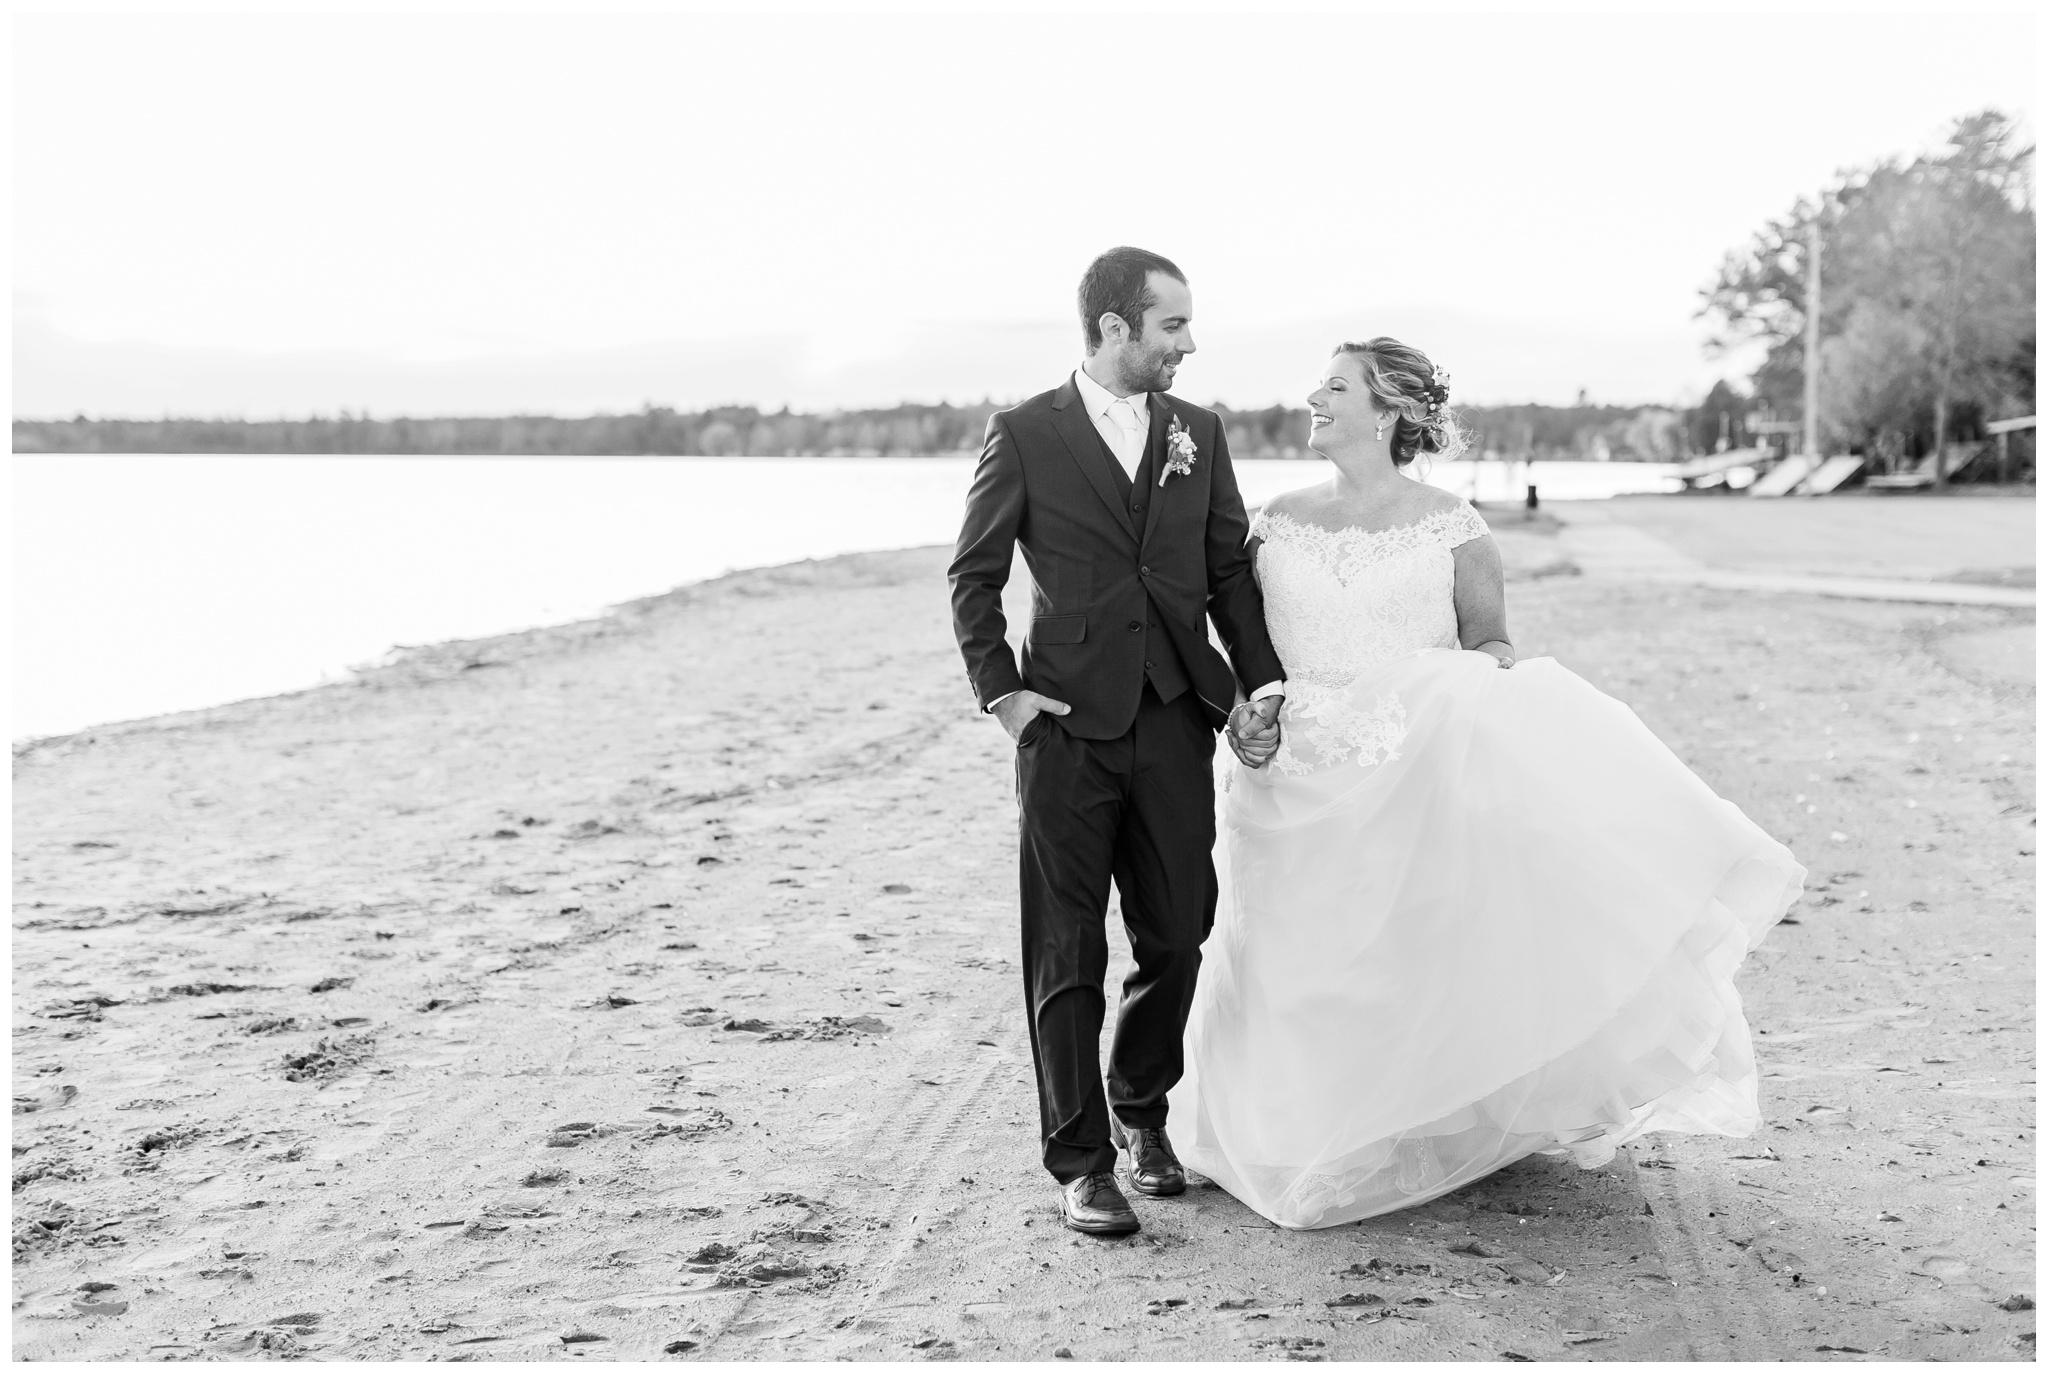 Shawano_County_park_Wedding_Caynay_Photo_Madison_Wi_2344.jpg